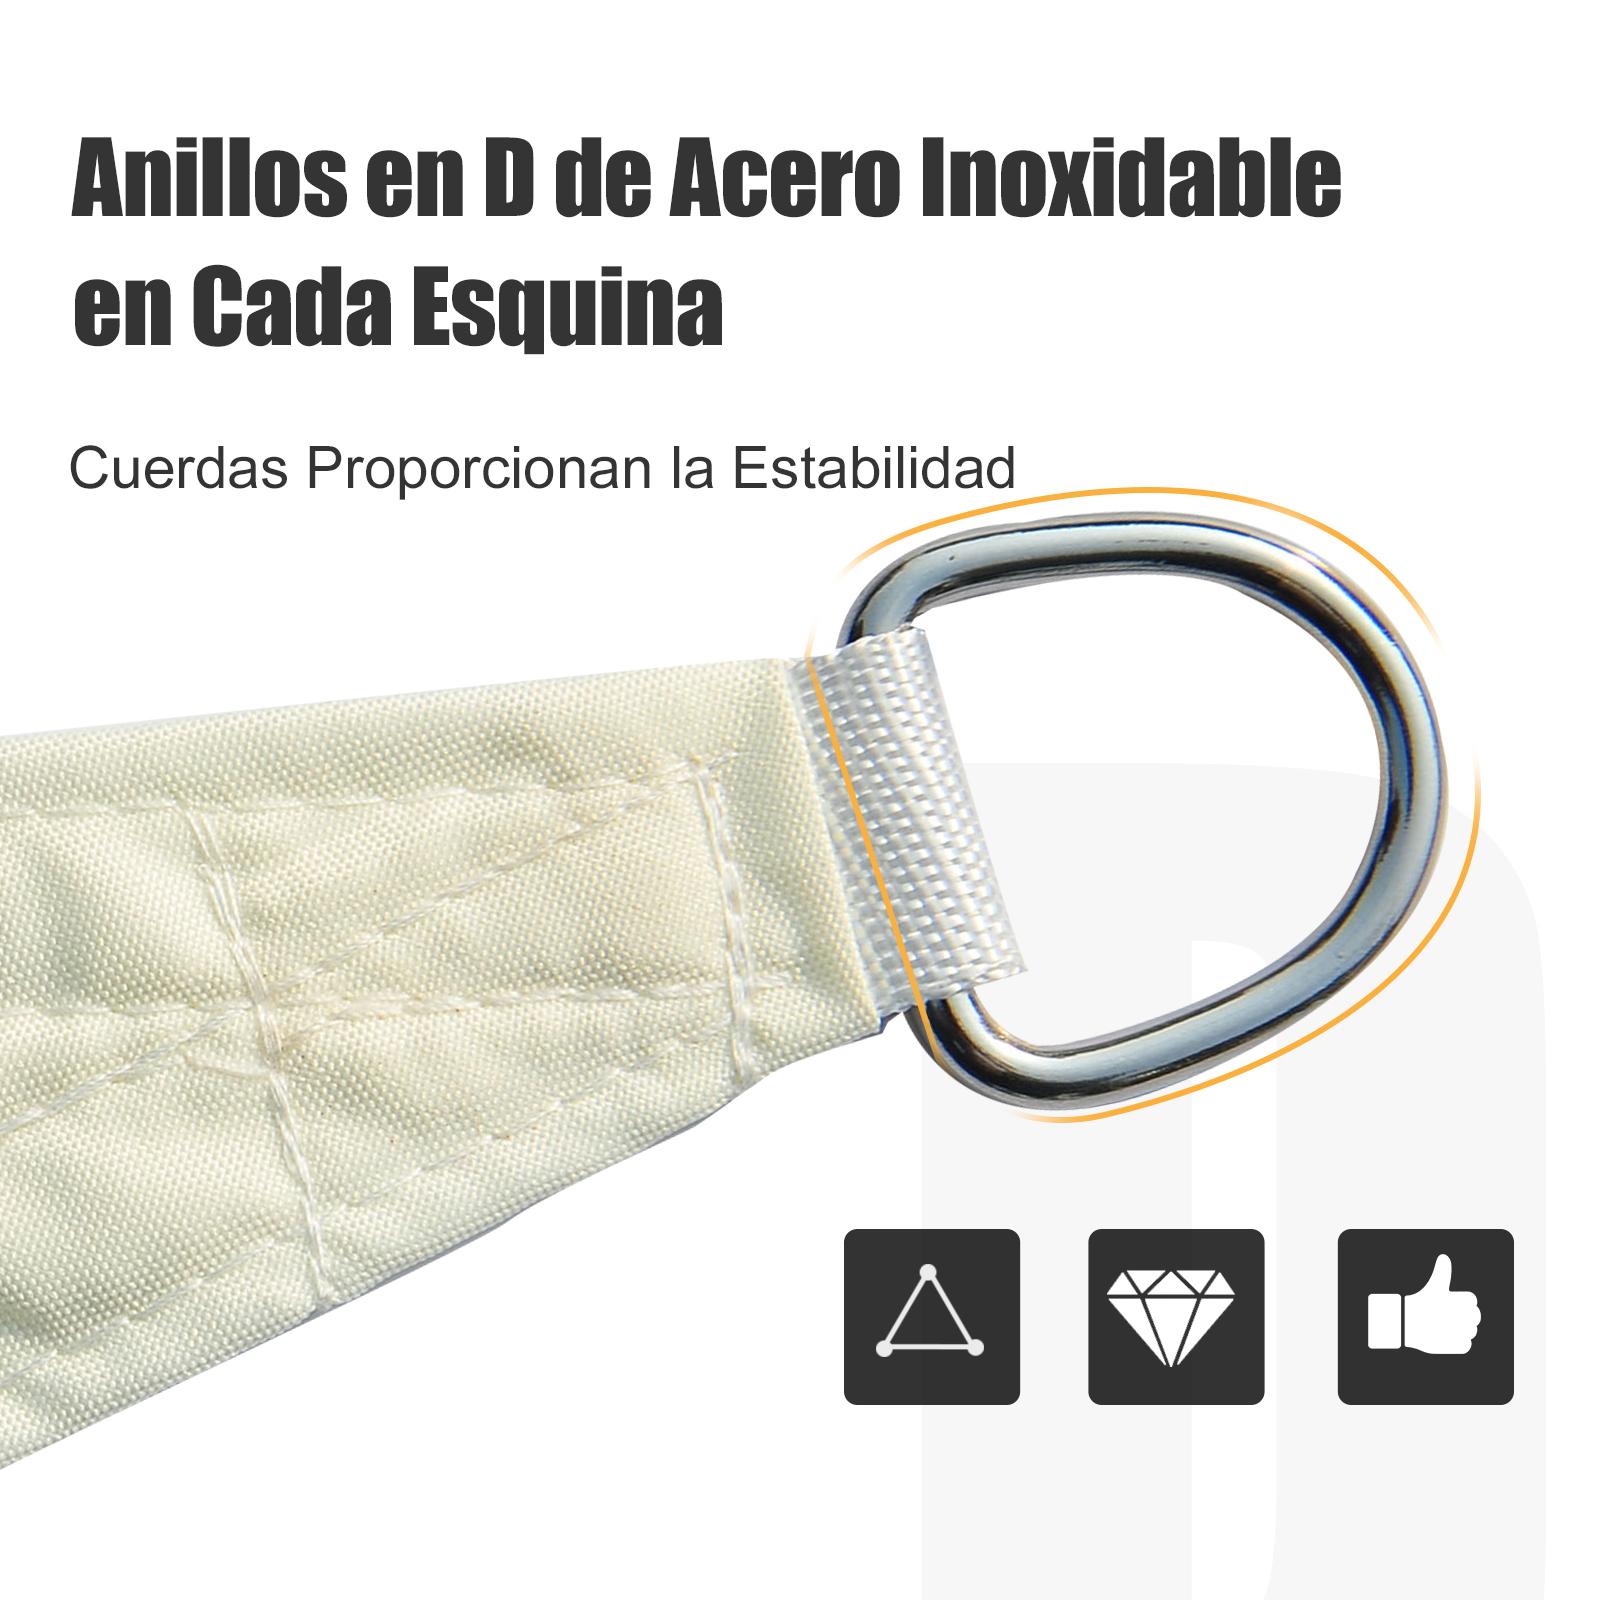 Toldo-Vela-Sombrilla-Parasol-Triangulo-Tejido-de-Poliester-160g-m2-Jardin-Playa miniatura 13